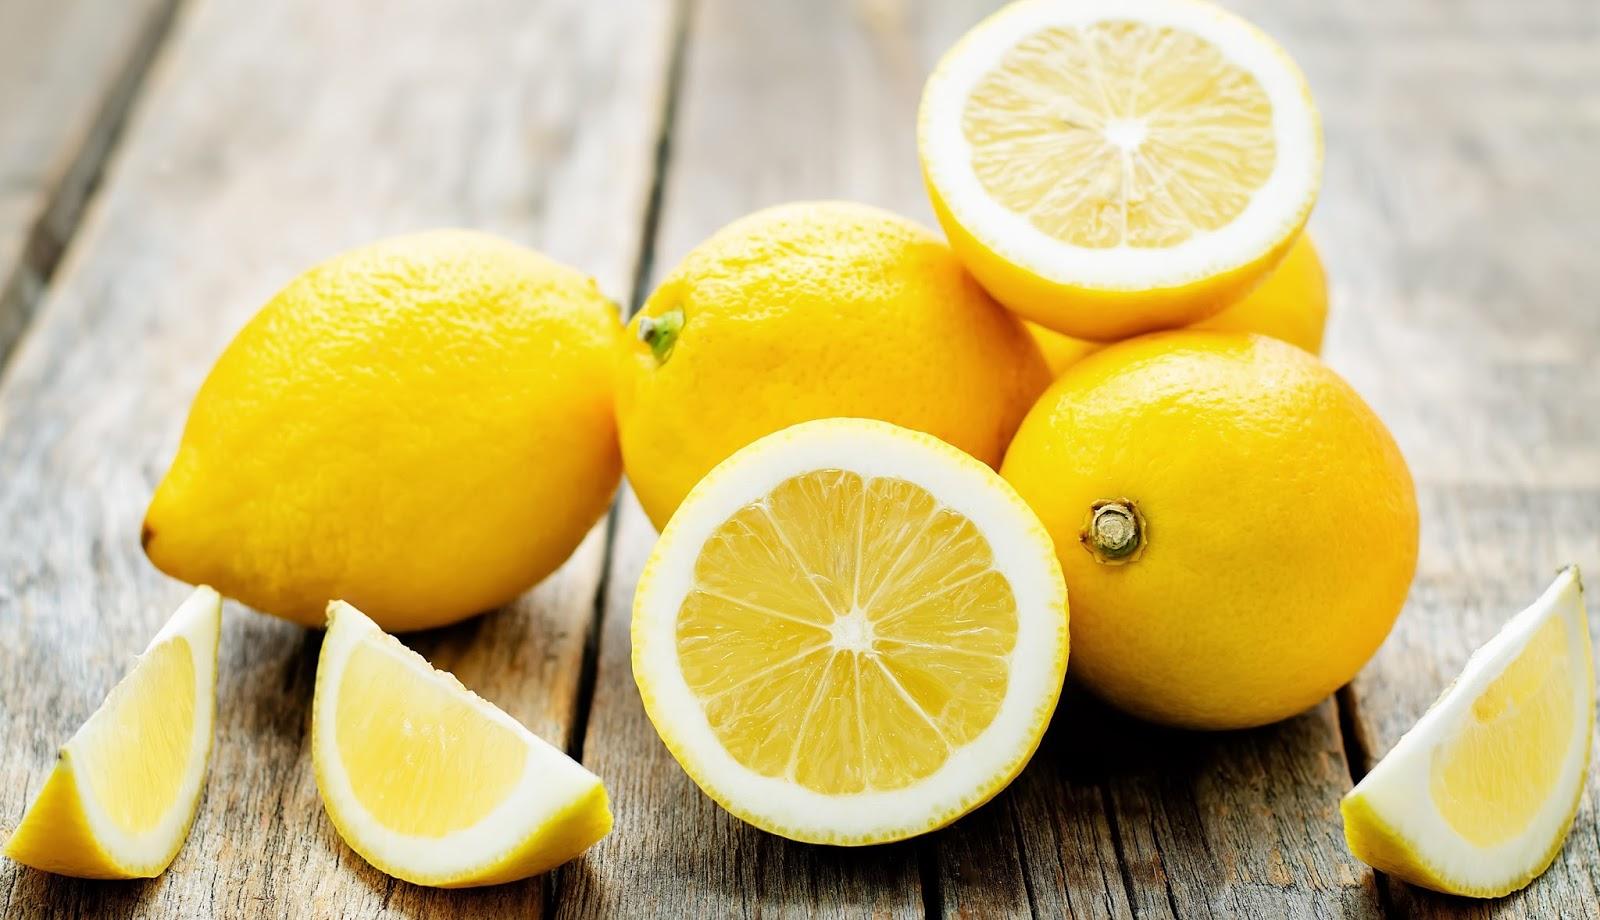 Sprigs of Rosemary: A Herniated Disc, Gabby's Lemonade and ...